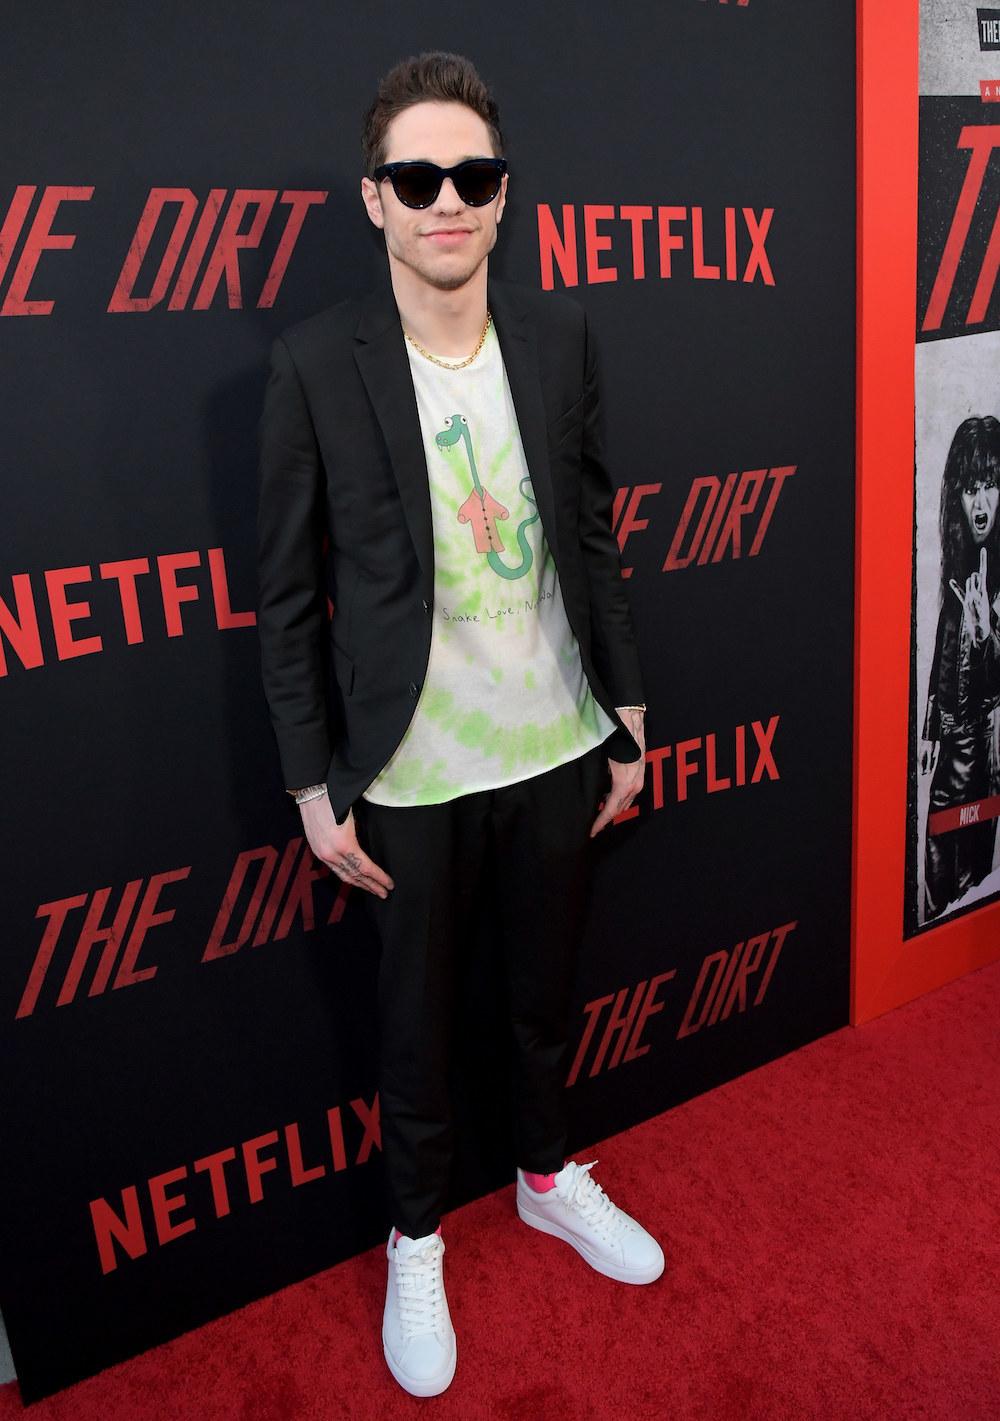 "Pete Davidson attends the premiere of Netflix's 'The Dirt"""